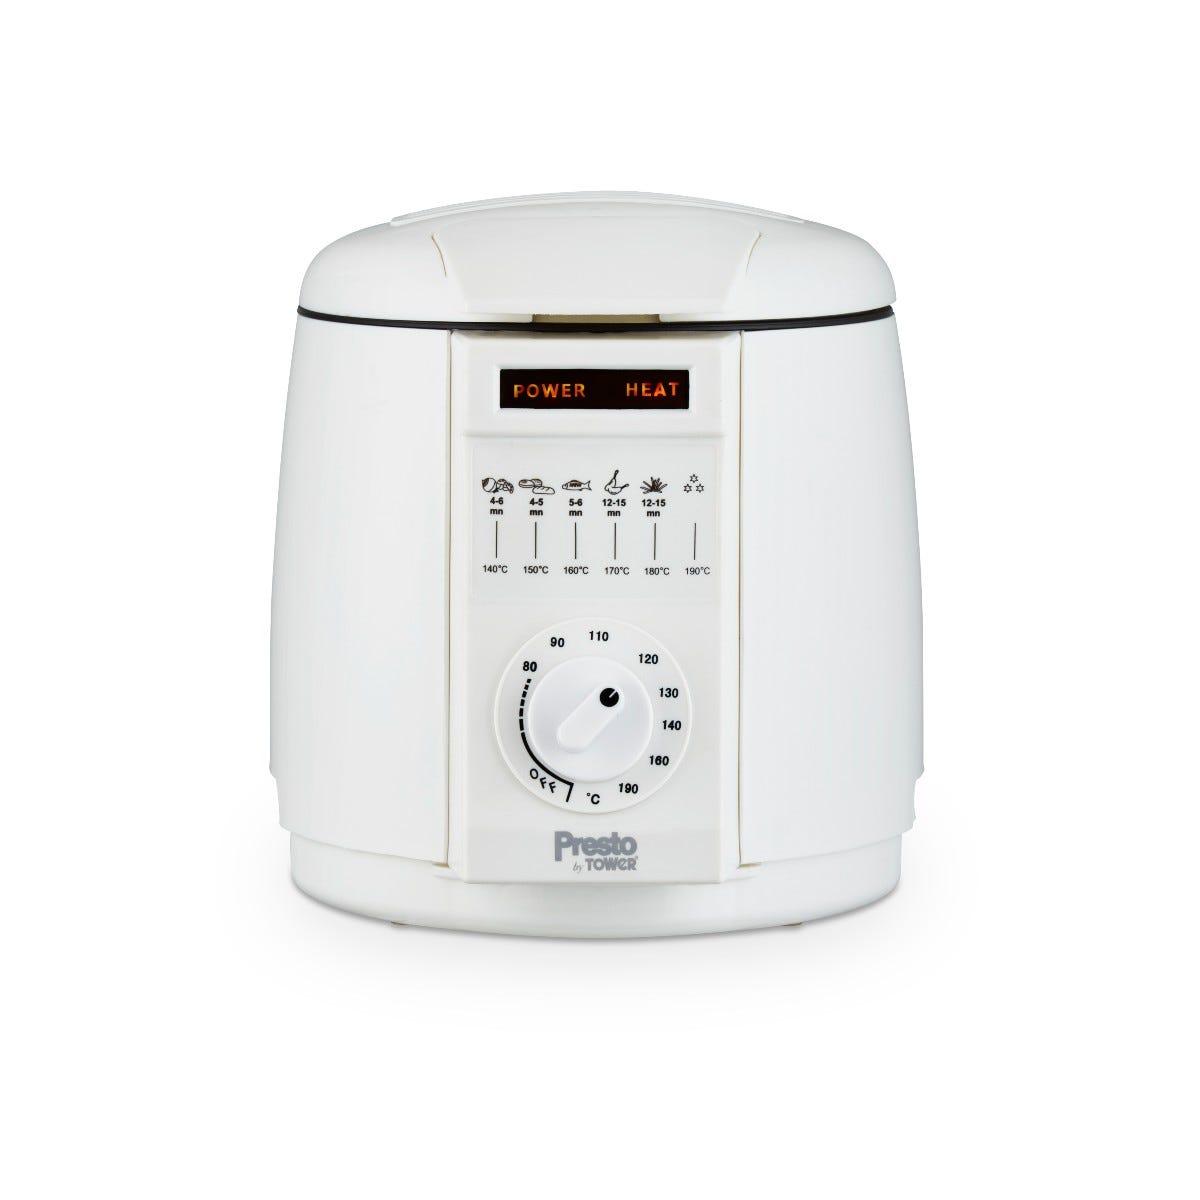 Tower PT1704WHT Presto 1L Deep Fat Fryer - White